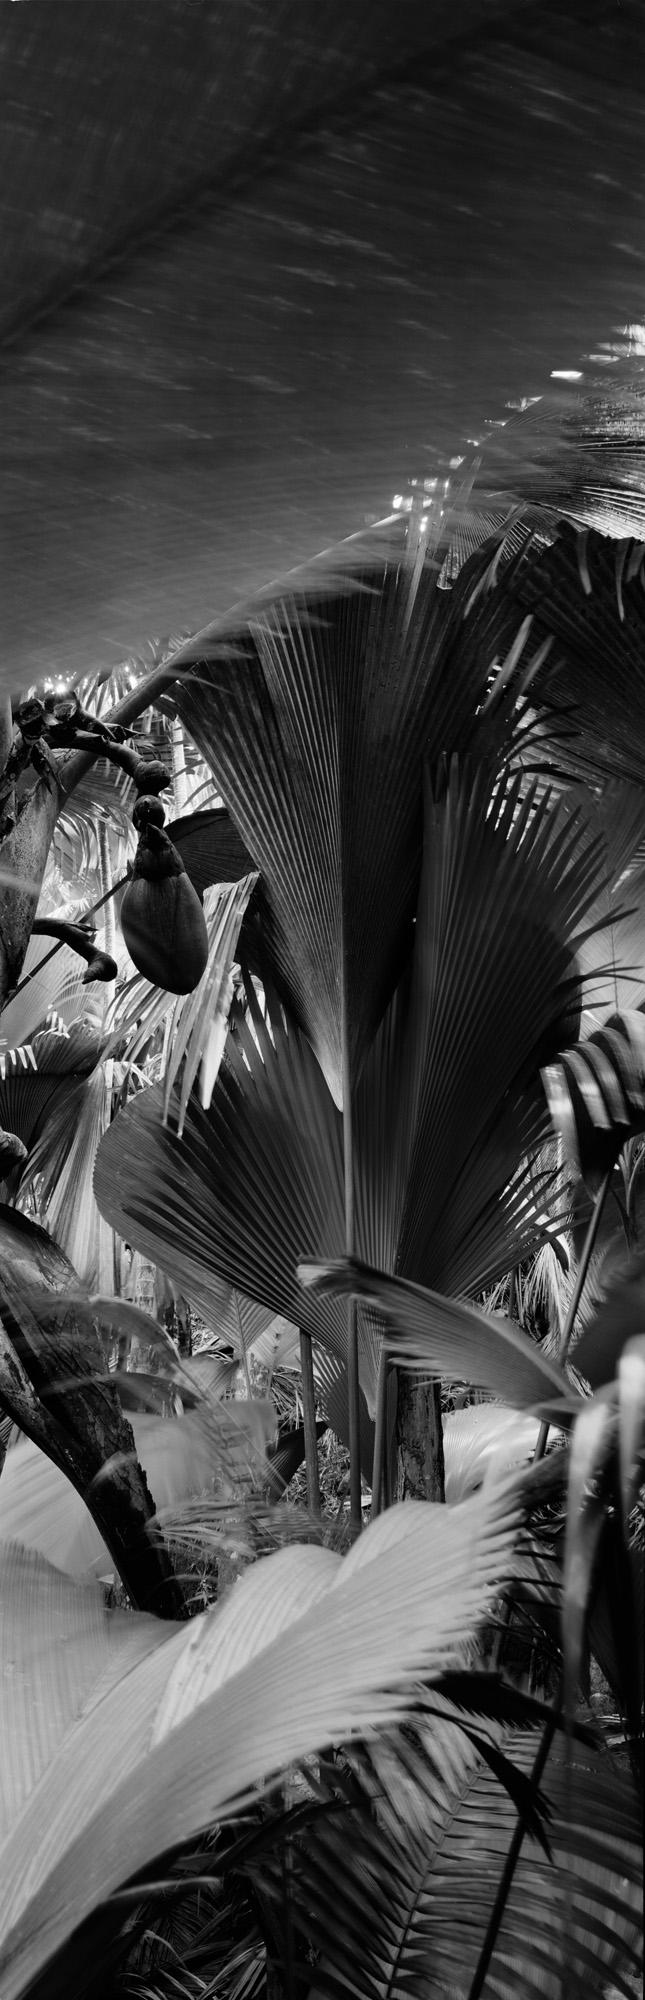 large format photography, Grossformatfotografie, Grossformatphotographie, Fotografie, Photographie, photography, 6x17, black and white, schwarzweiss, bw, sw, fine art, Kunst, Palmen, palm trees, Farne, ferns,